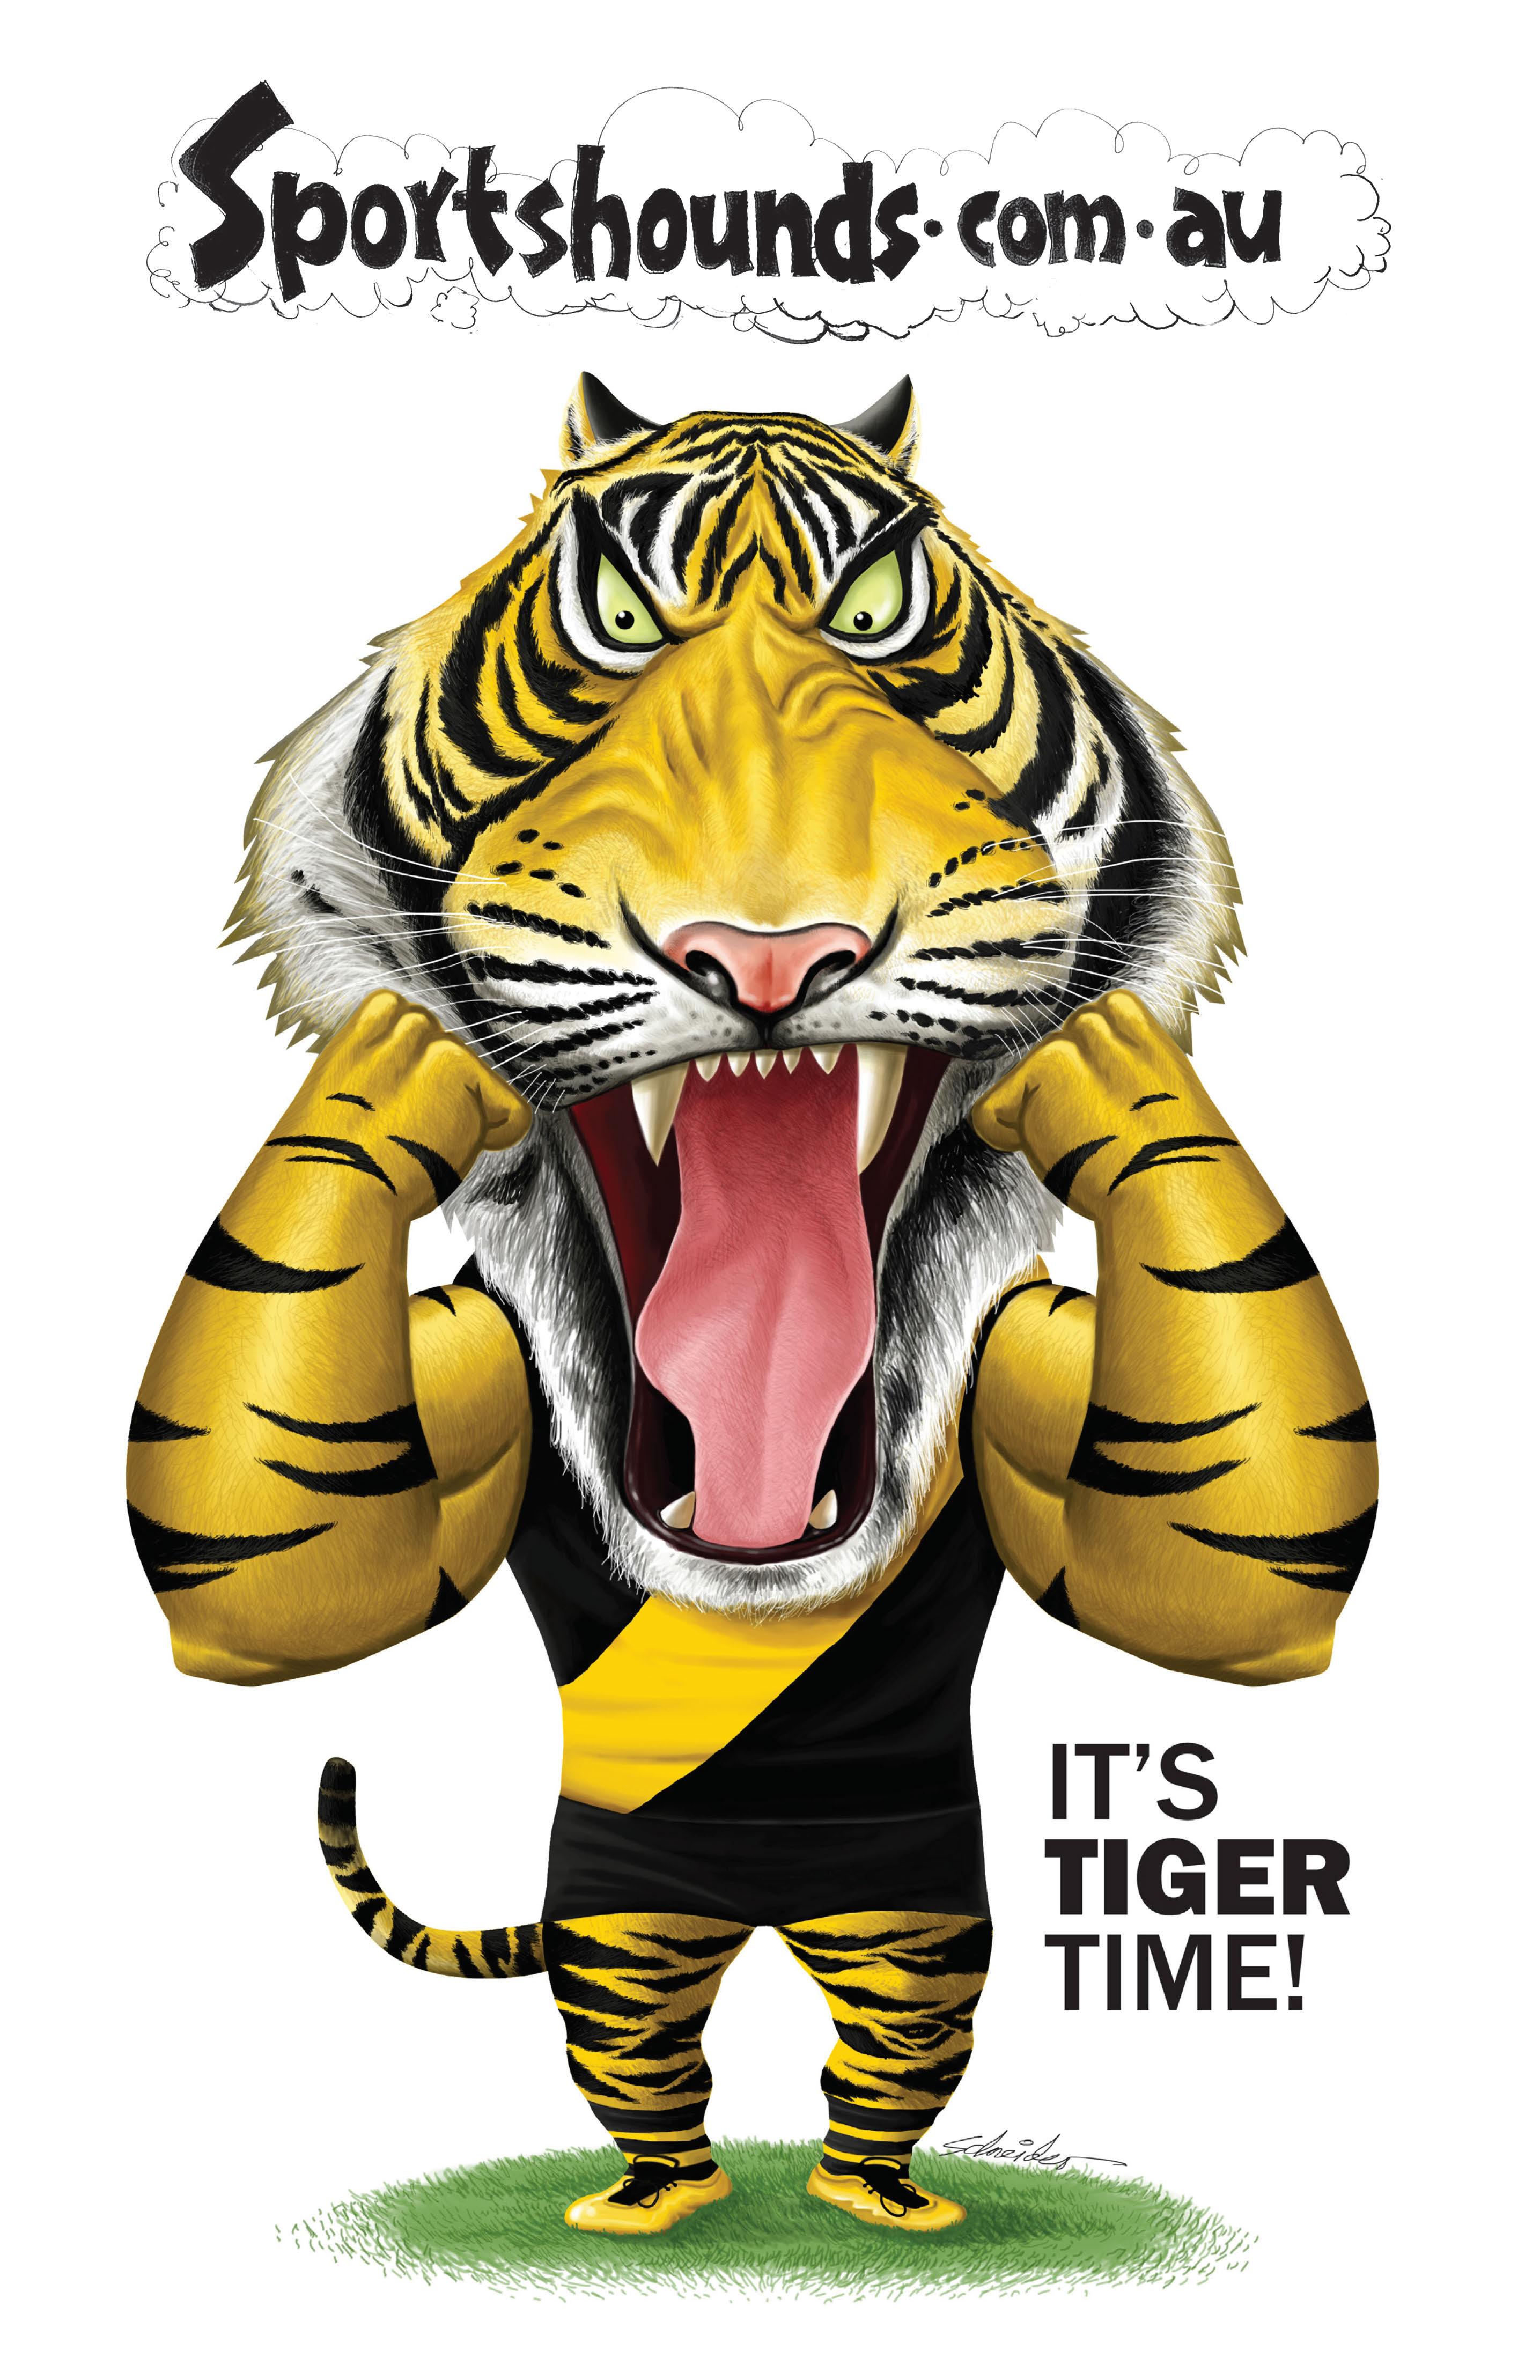 Tiger time poster